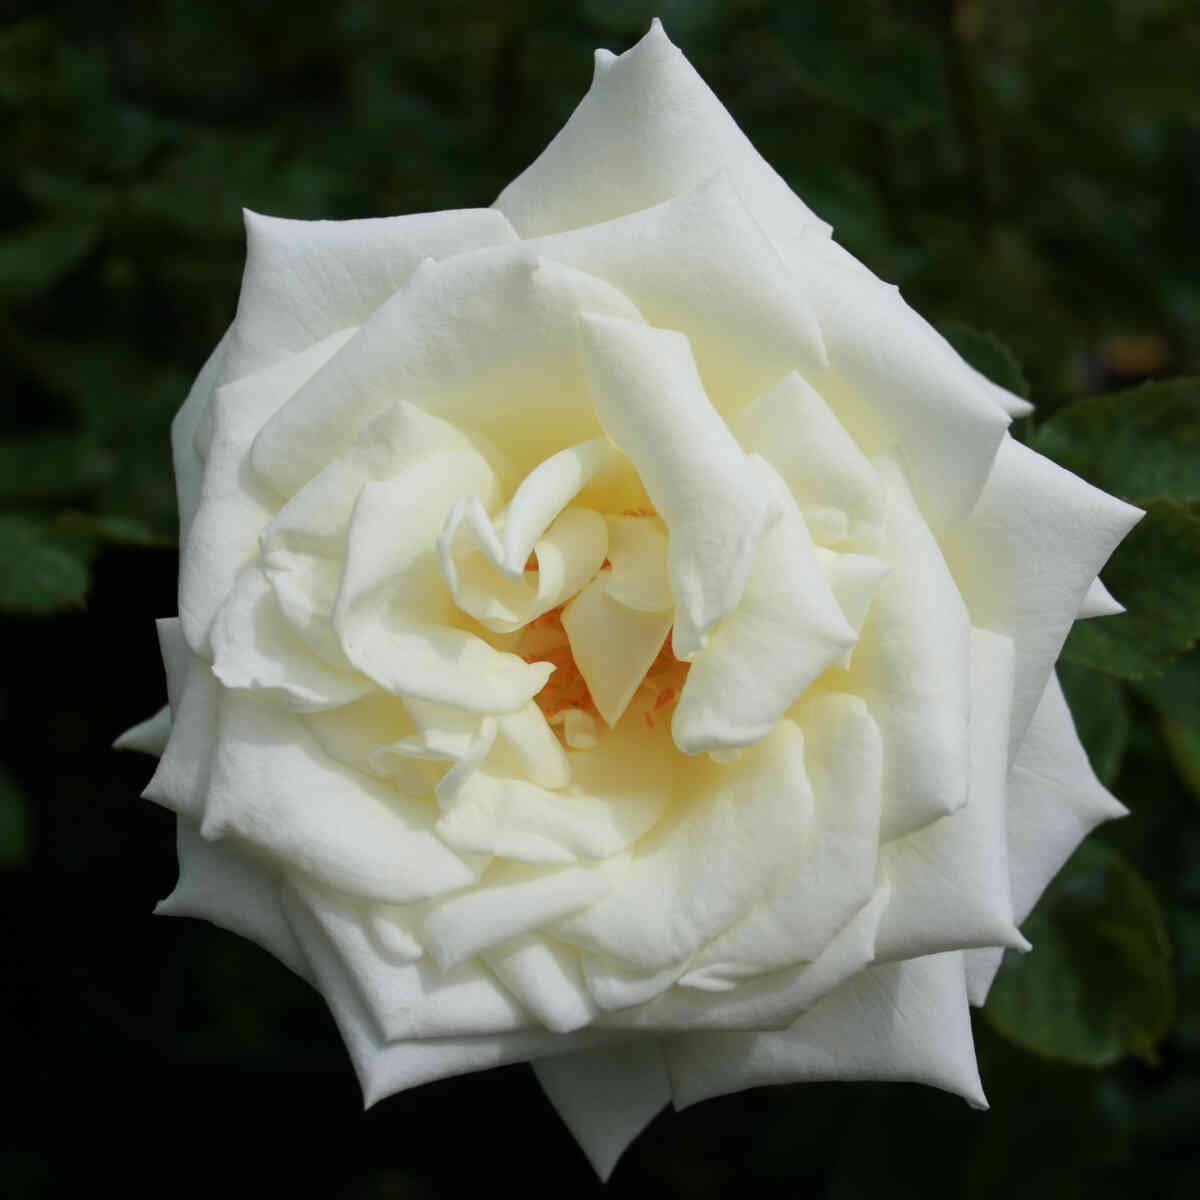 Rose 'Polarstern'